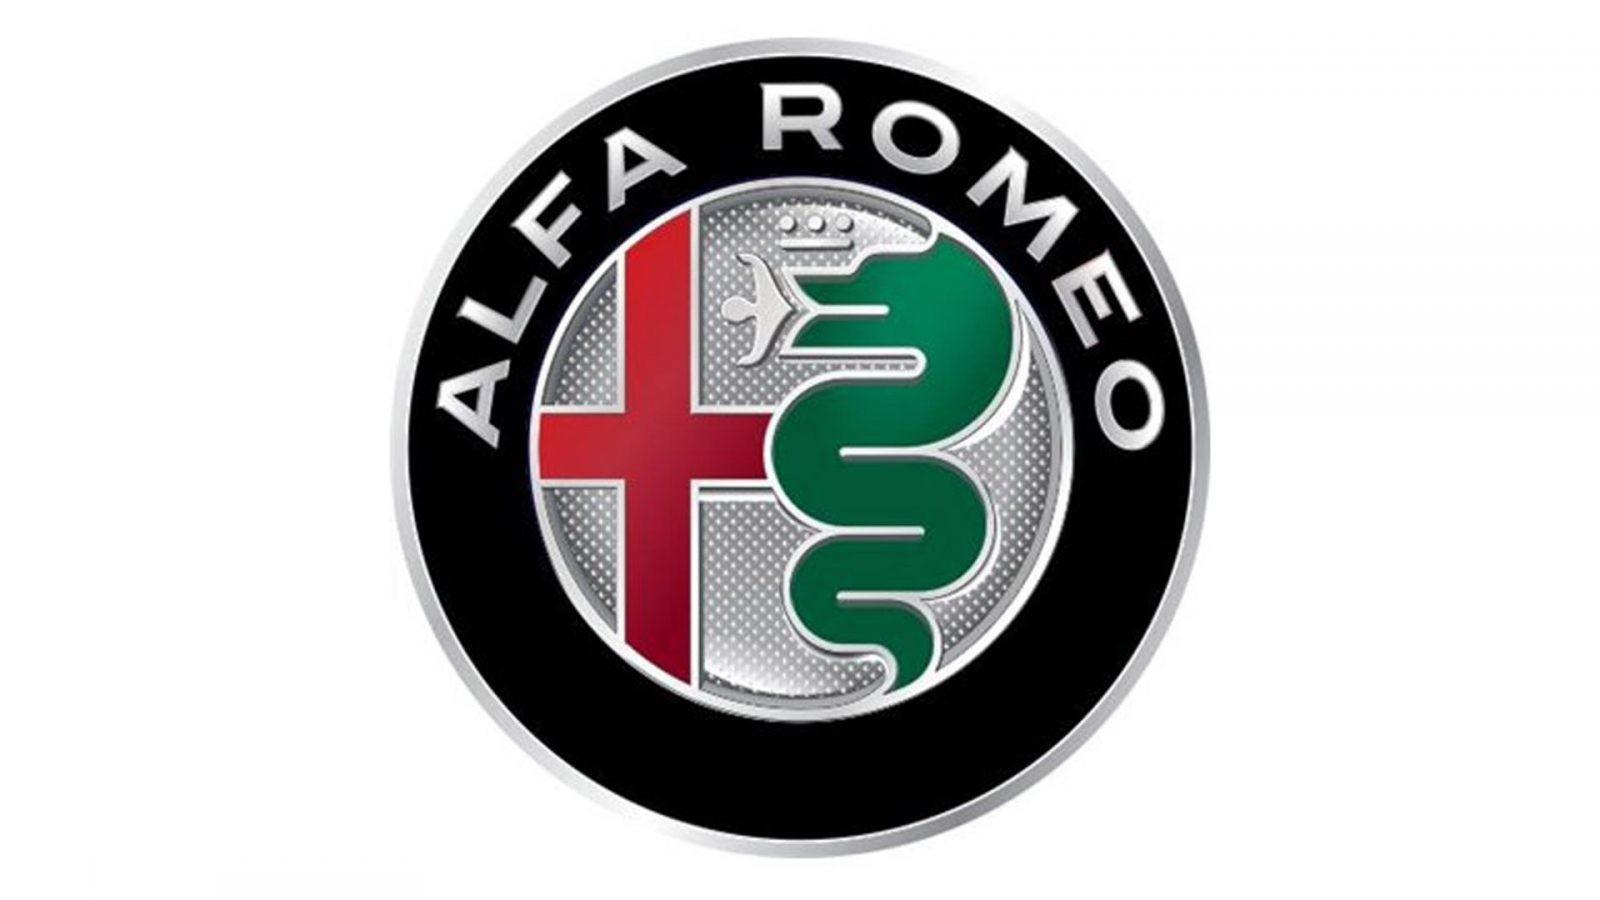 Alfa Romeo 156 1.9 16V JTDm 110kW MultiJet 2004 – 2006